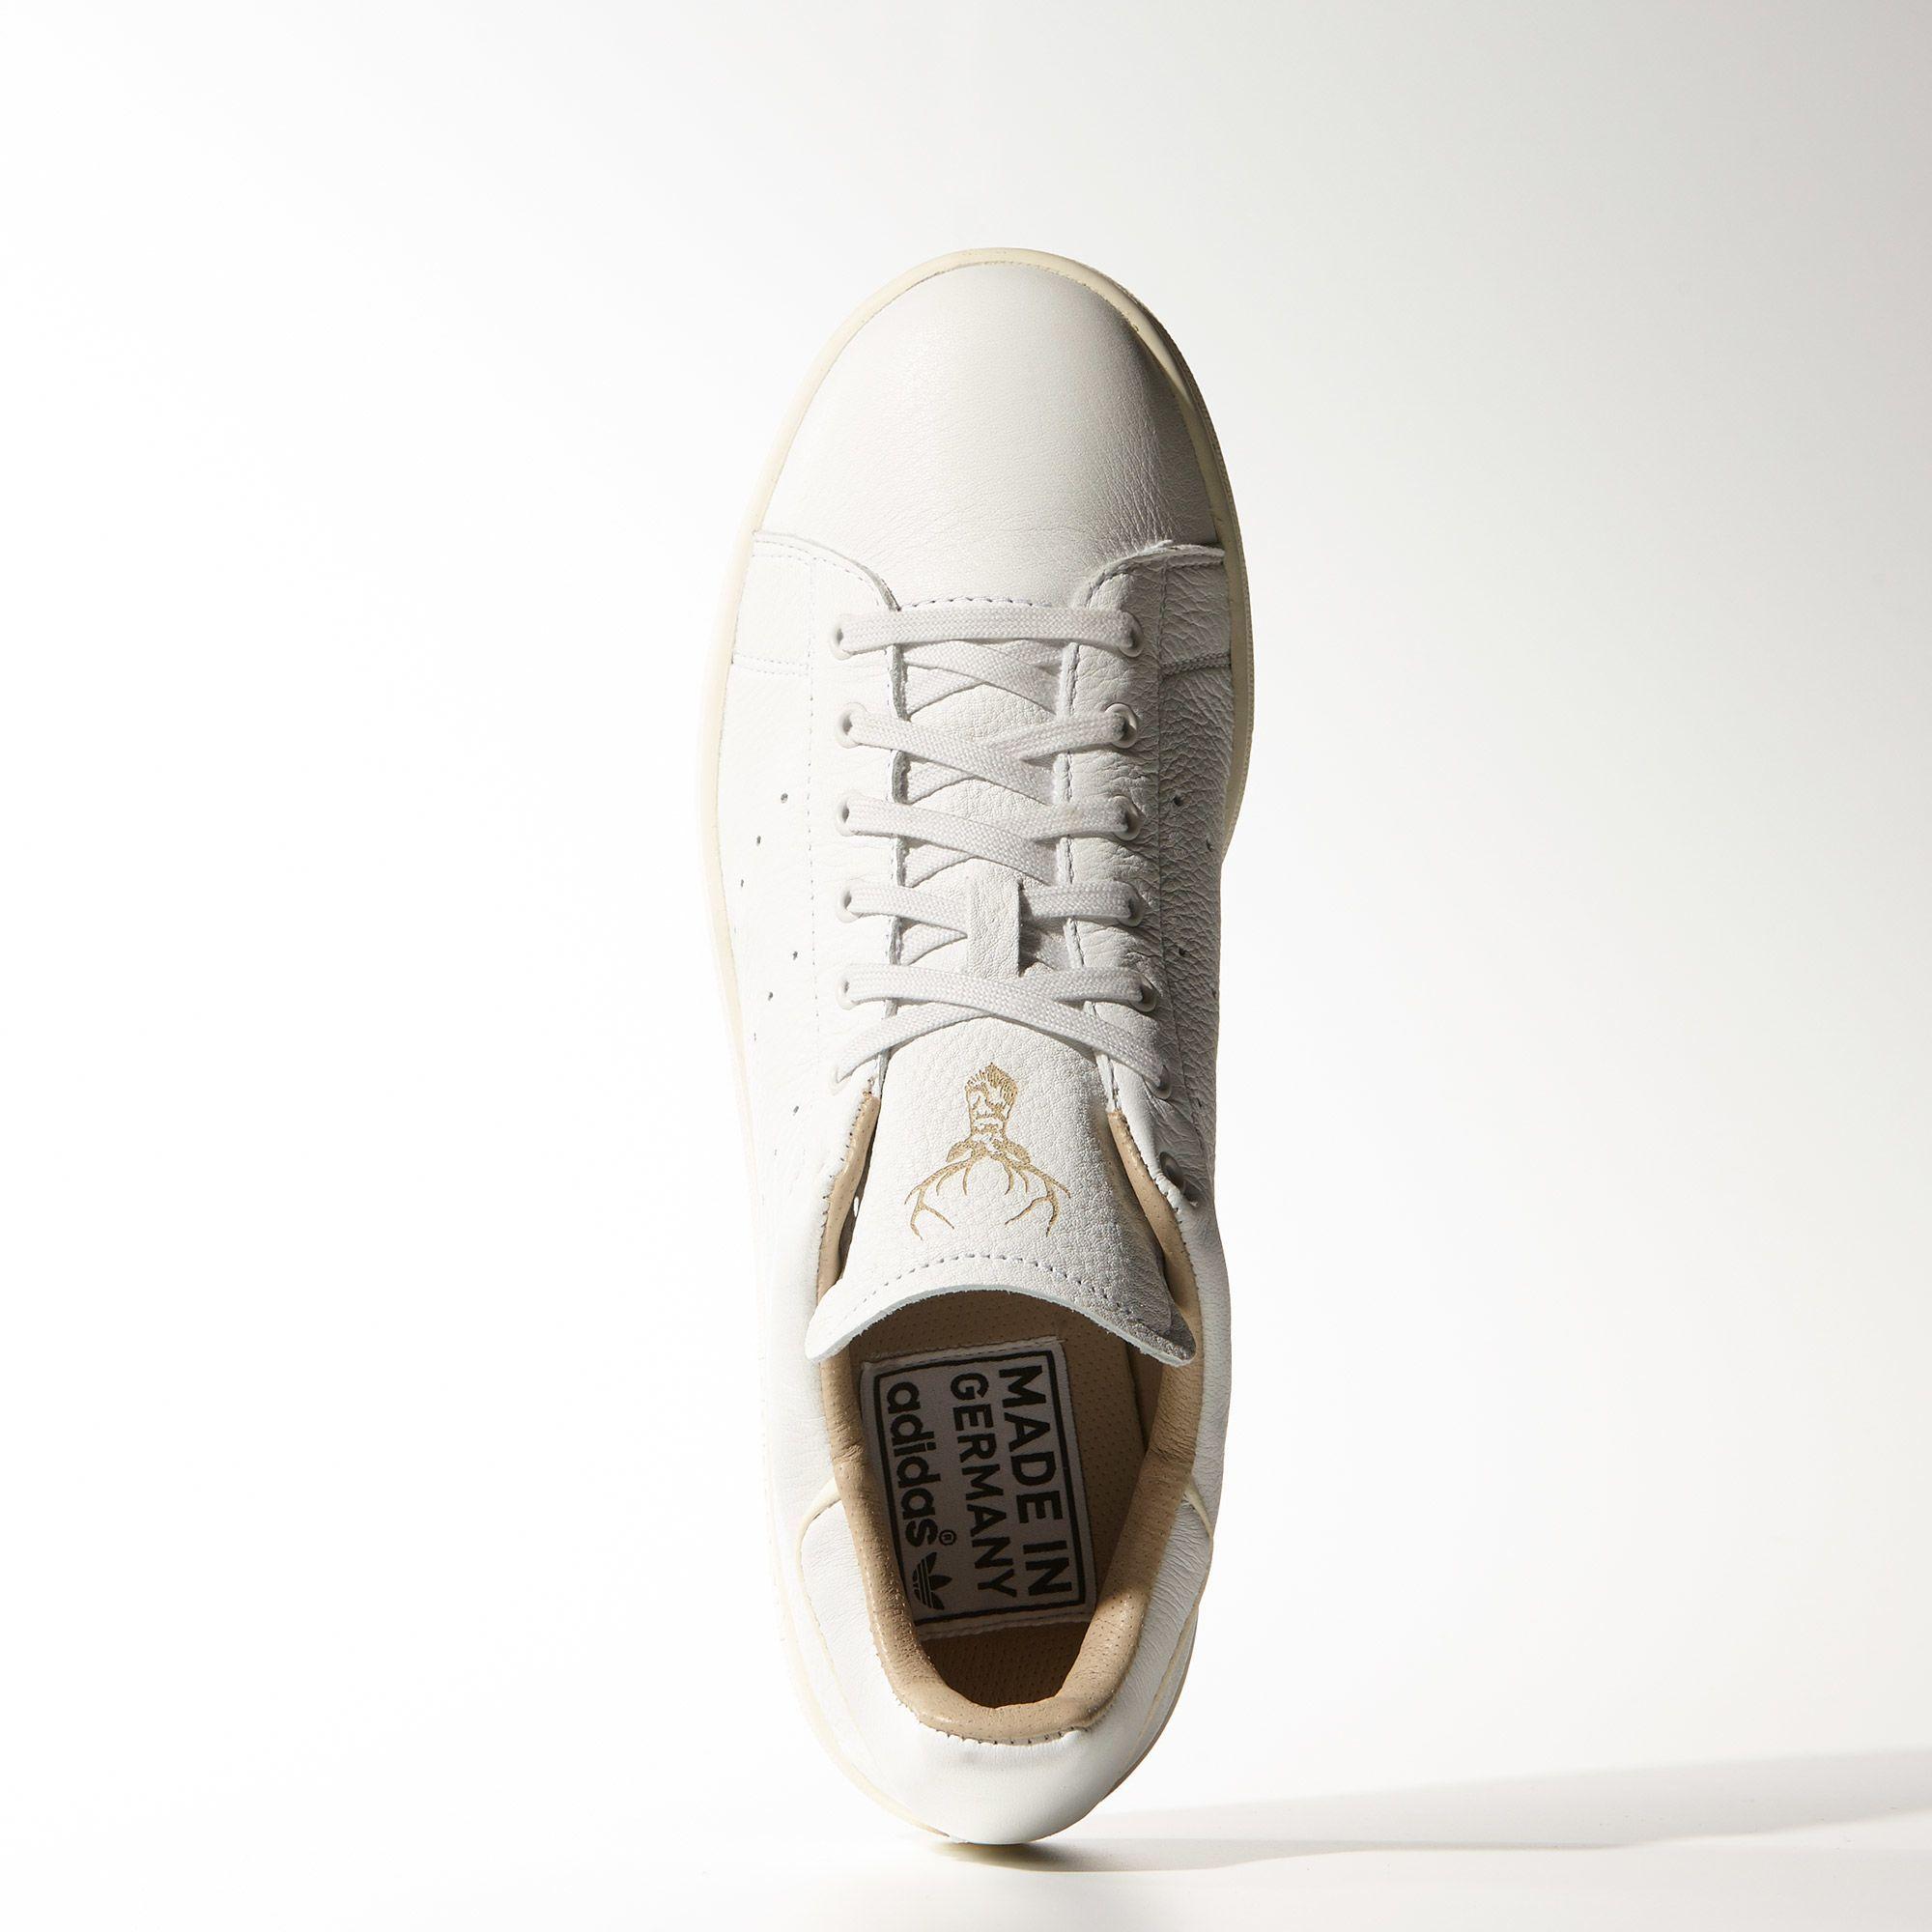 réplica aceleración autobús  adidas Stan Smith Made in Germany Shoes | adidas US